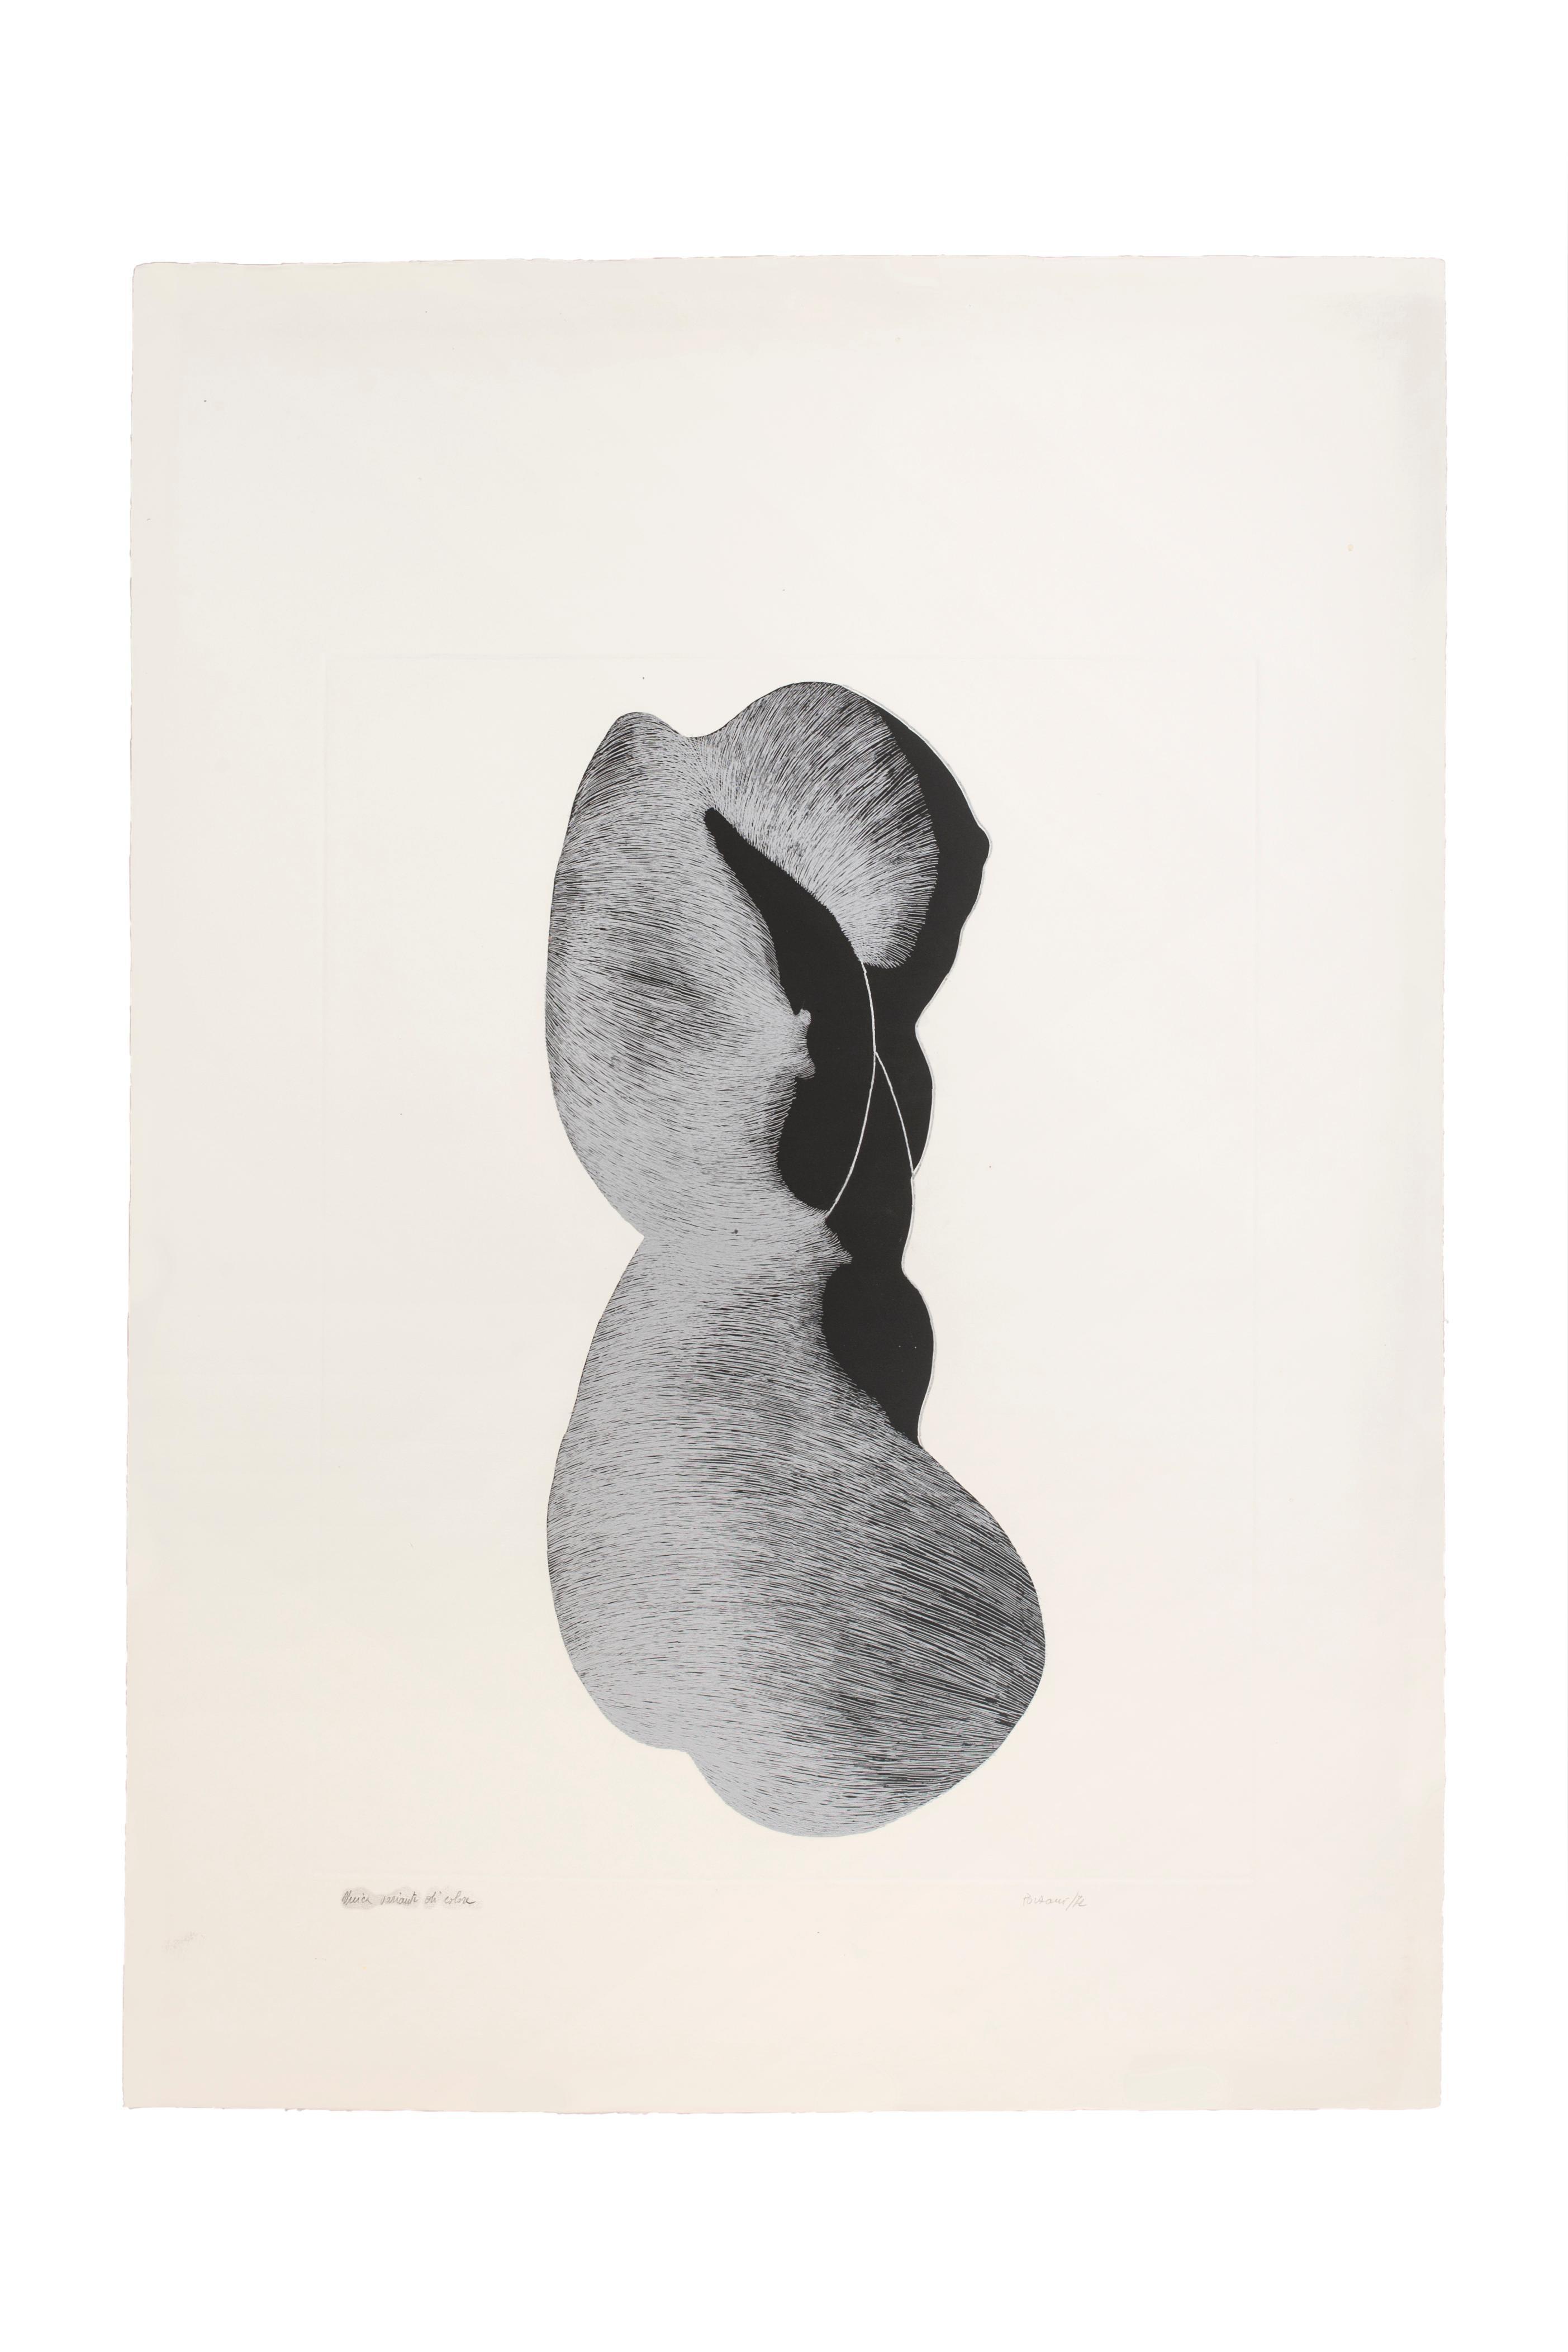 Silhouette III - Original Etching by Giacomo Porzano - 1972